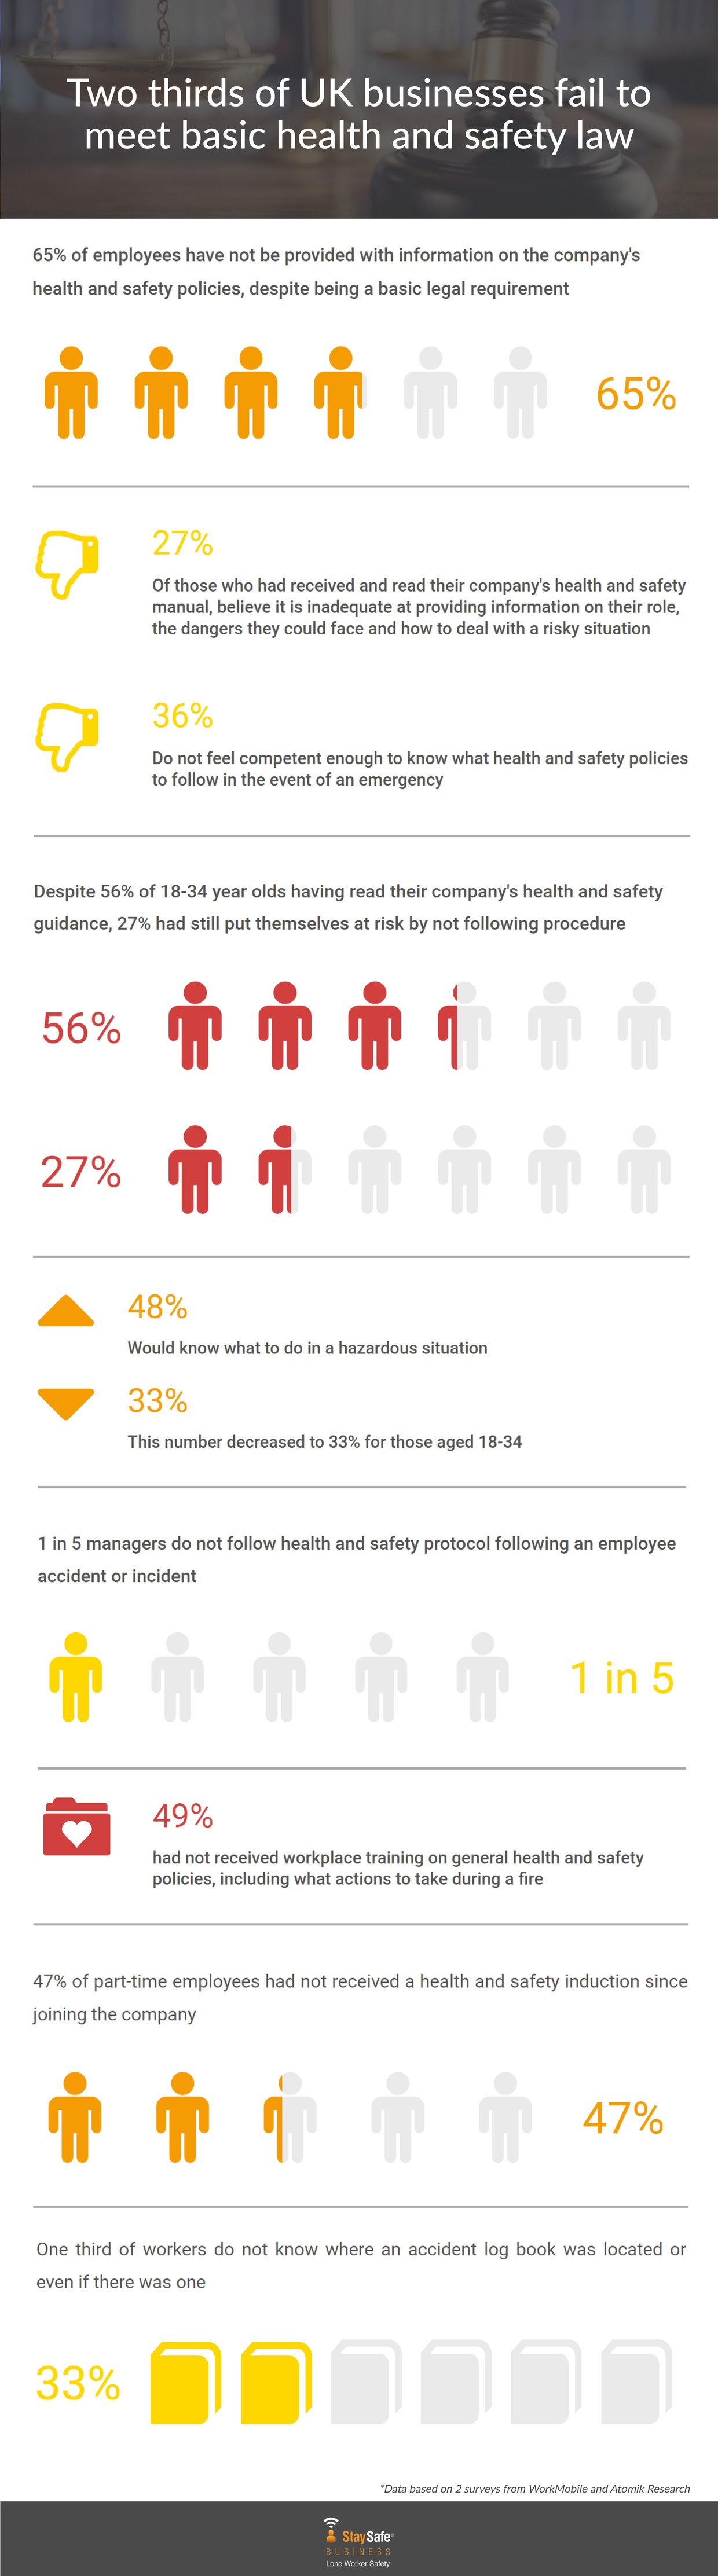 rsz_survey_statistics_infographic